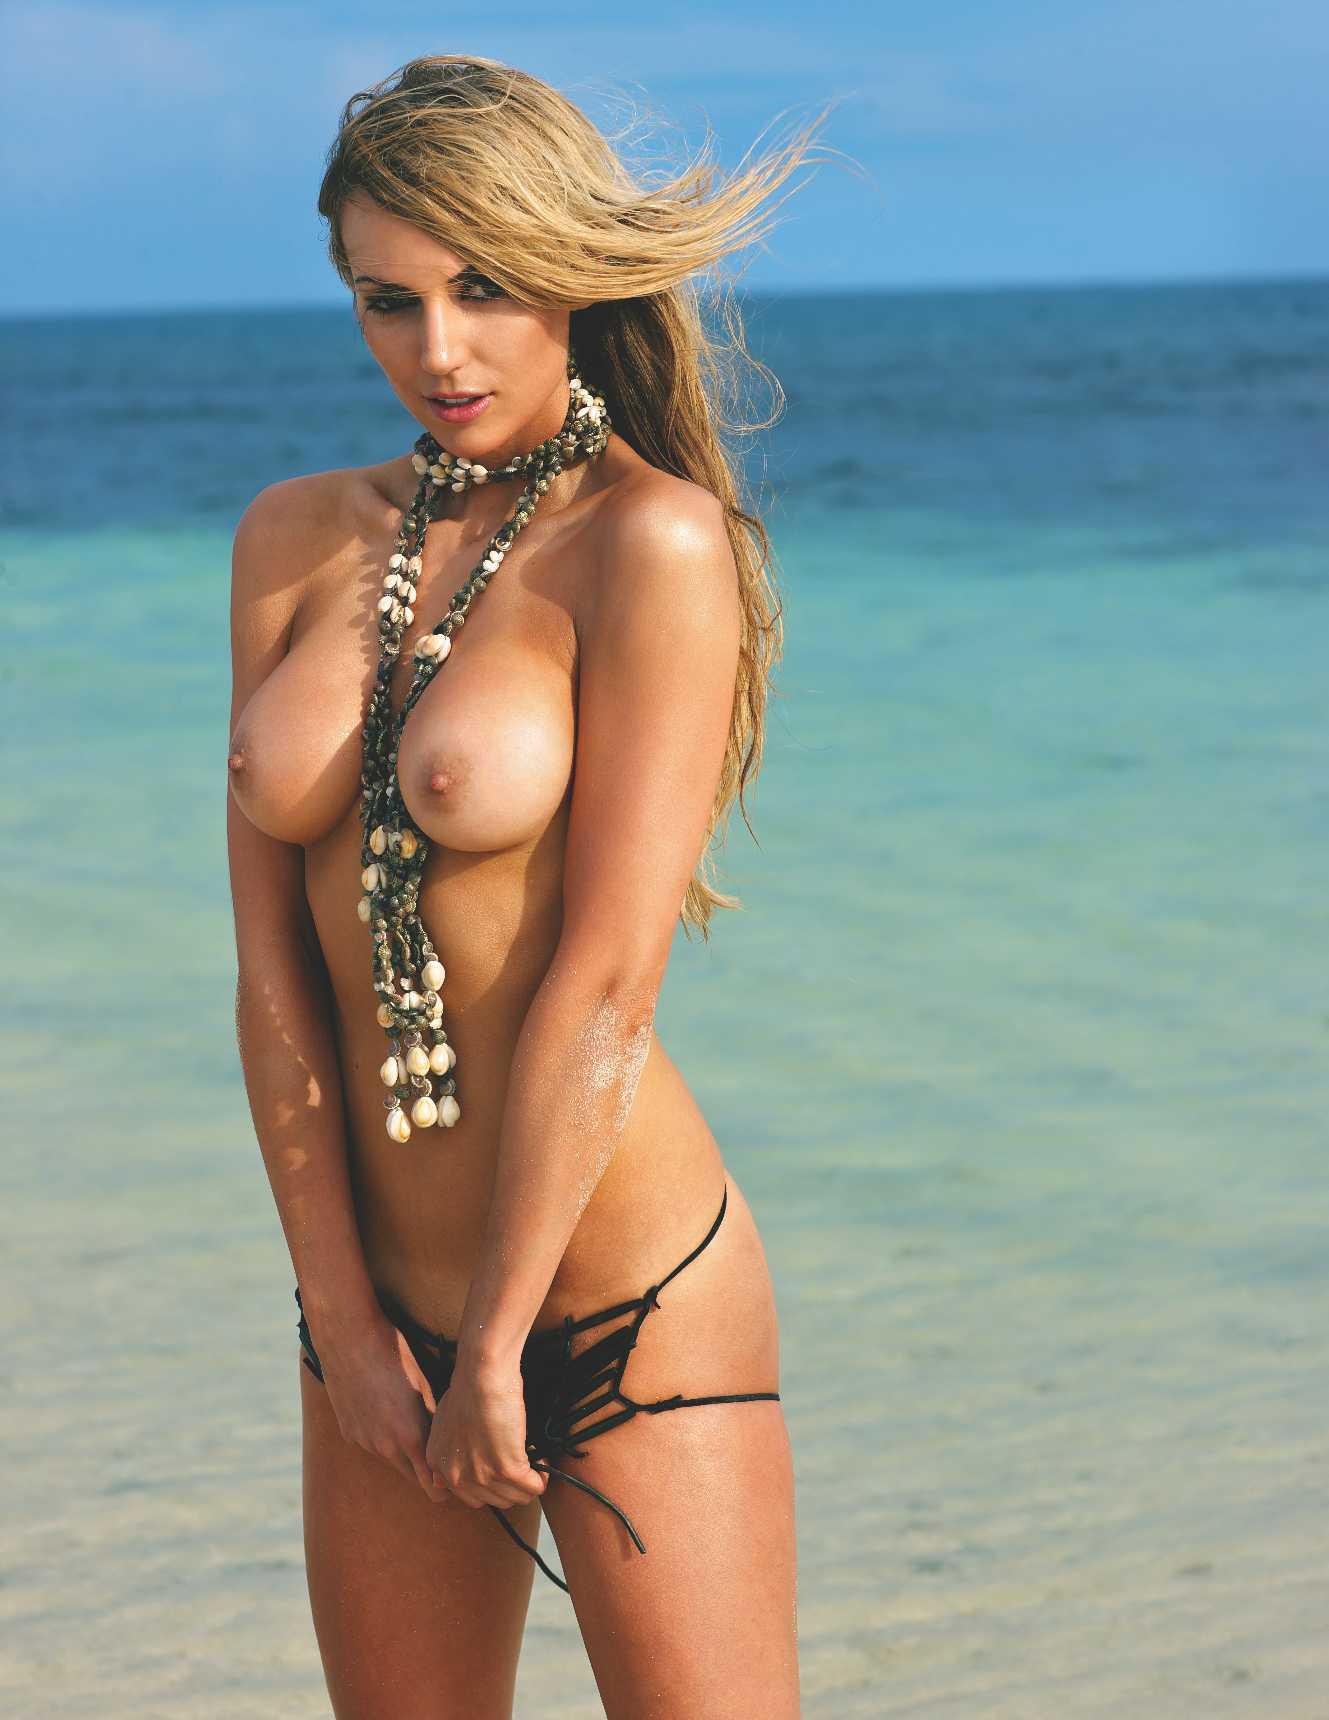 22742_septimiu29_RosannaDavison_PlayboyGermany_Oct20128_123_470lo.jpg